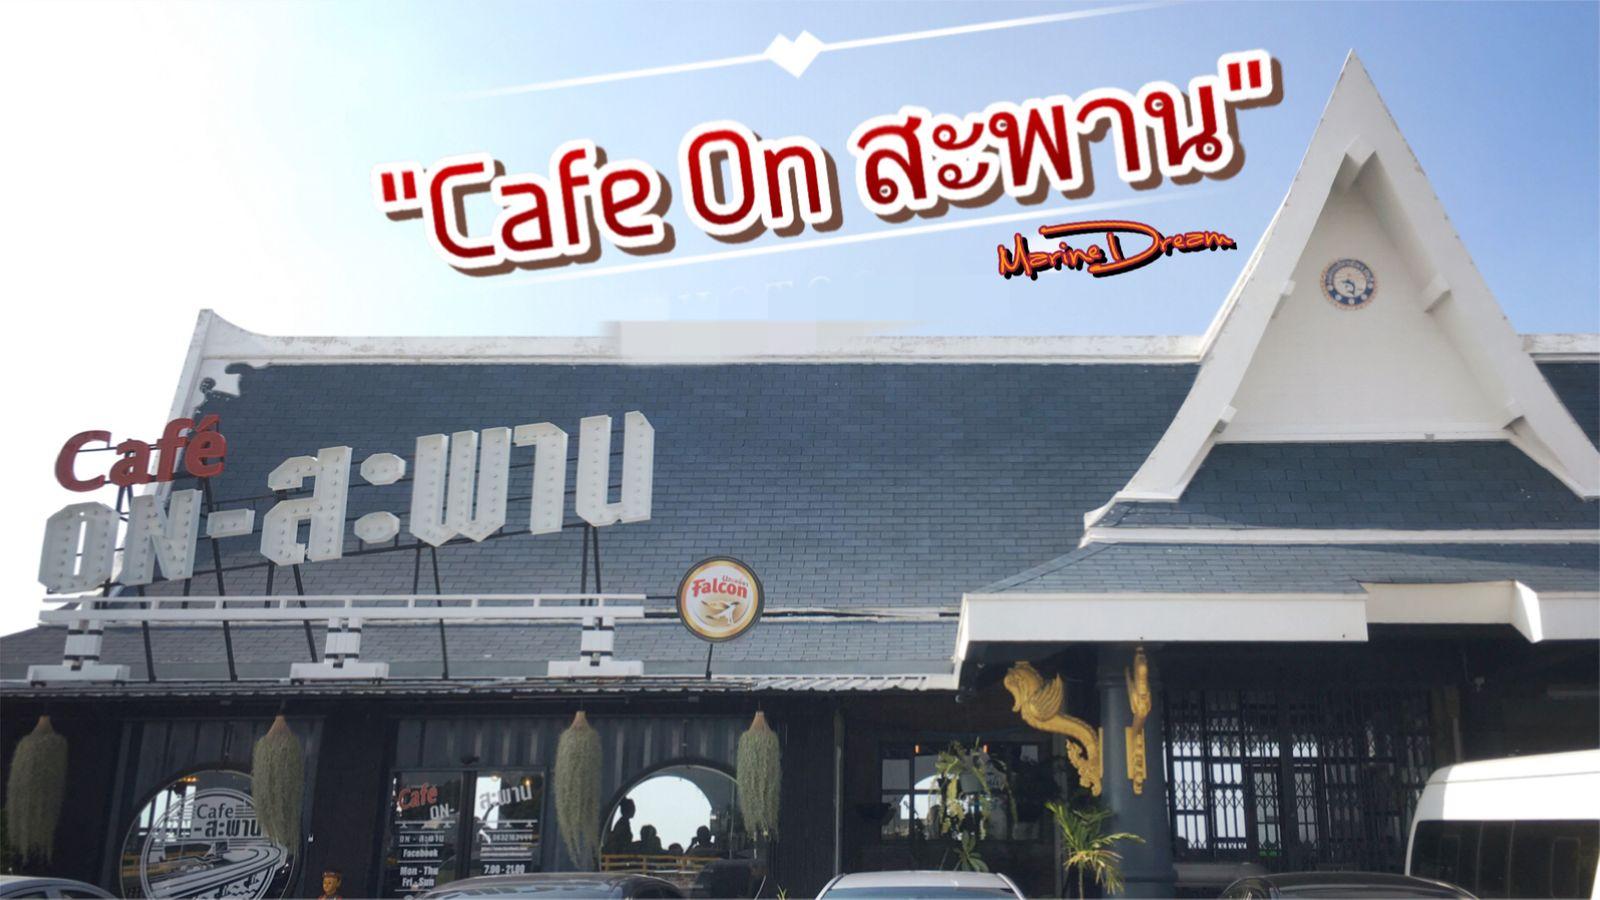 """Cafe on สะพาน"""